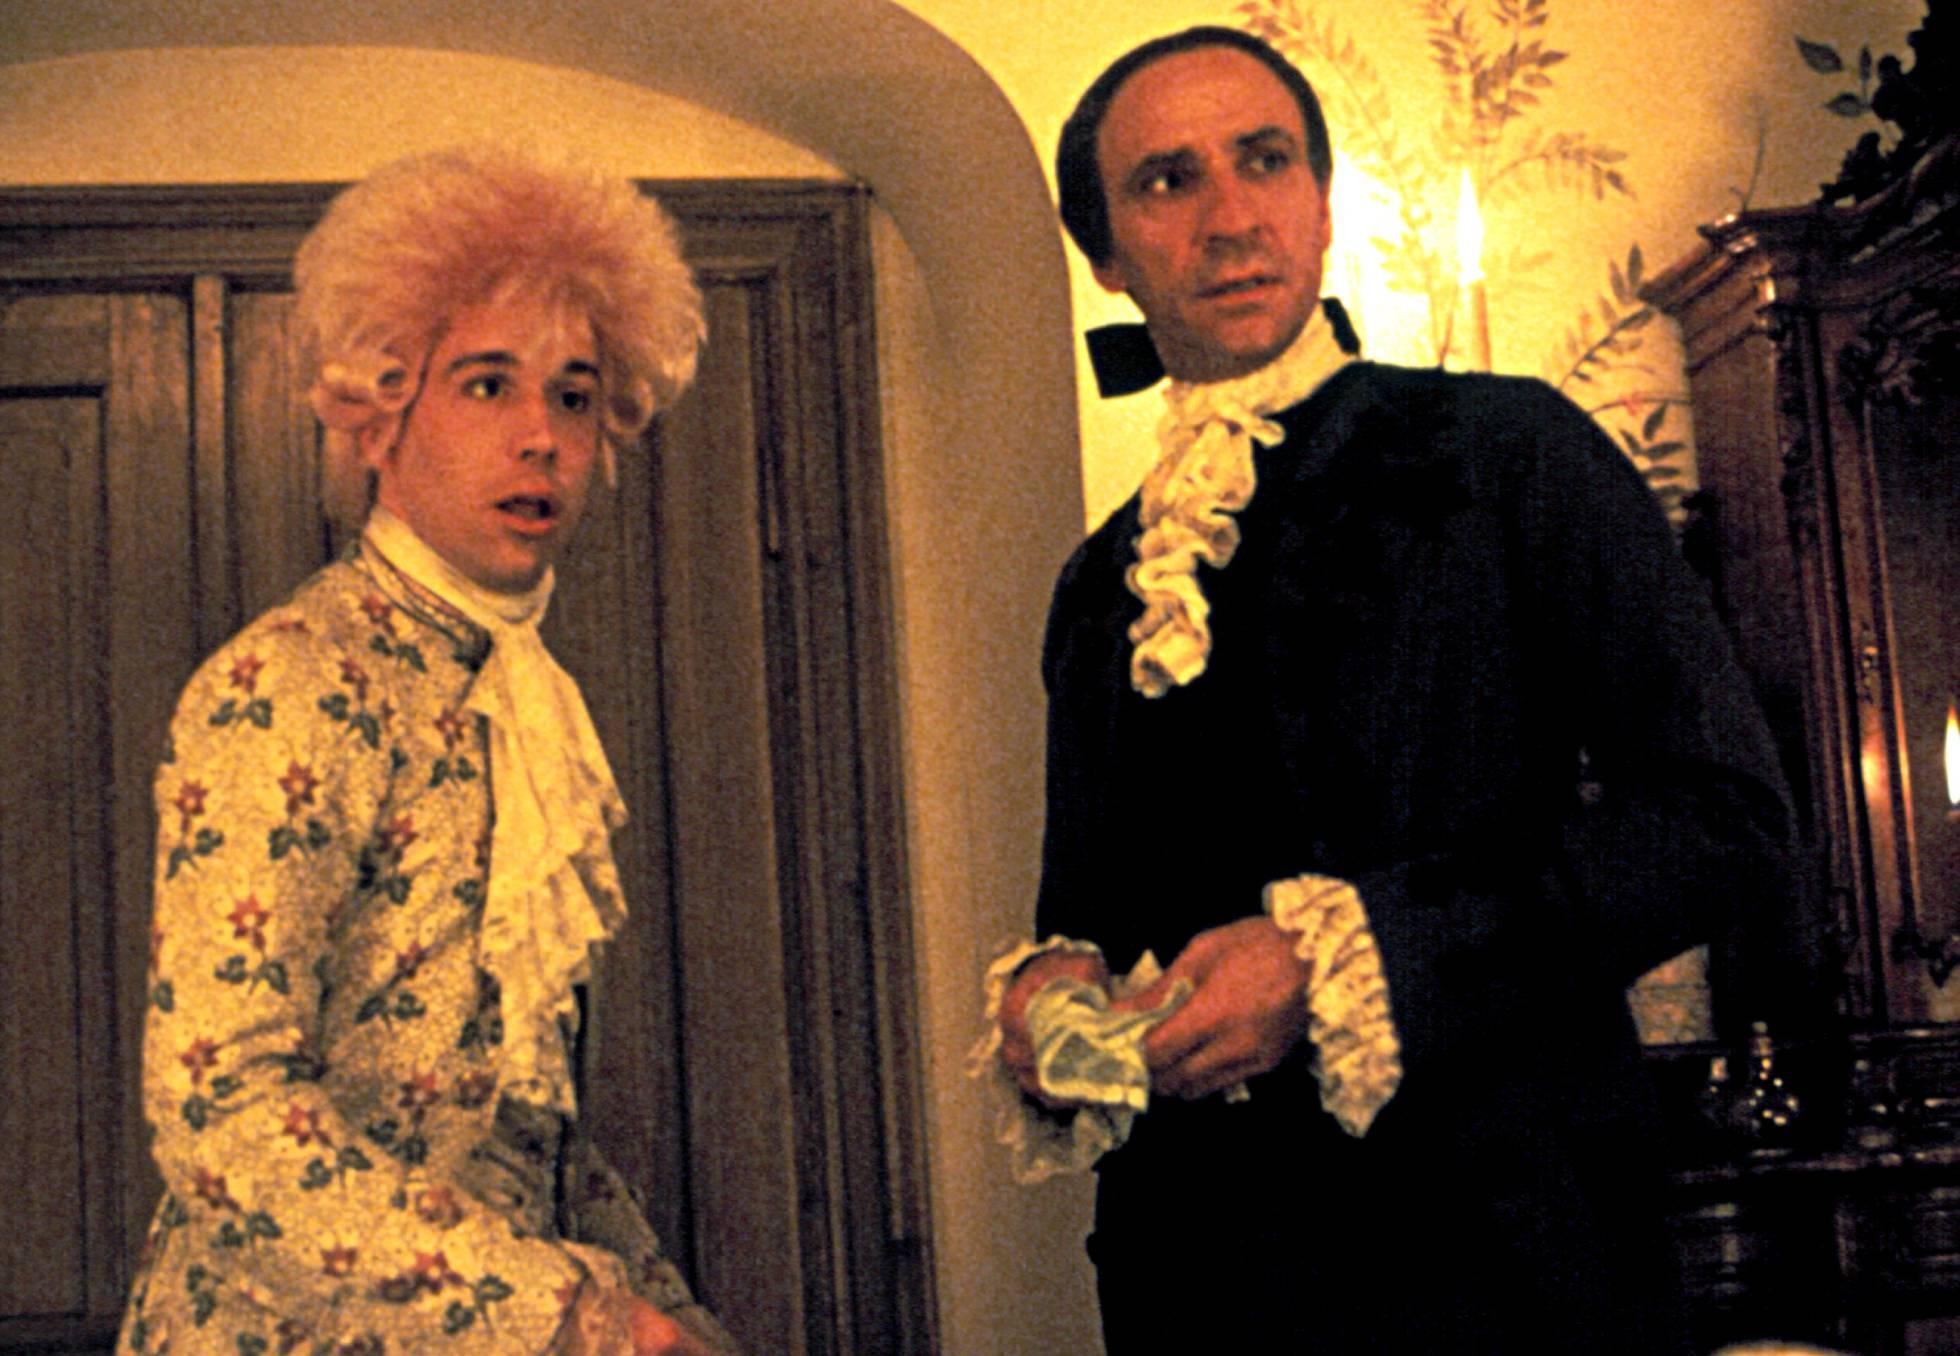 Mozart e Salieri en 'Amadeus', mestura de odio e xenio.'Amadeus', mezcla de odios y genialidad.